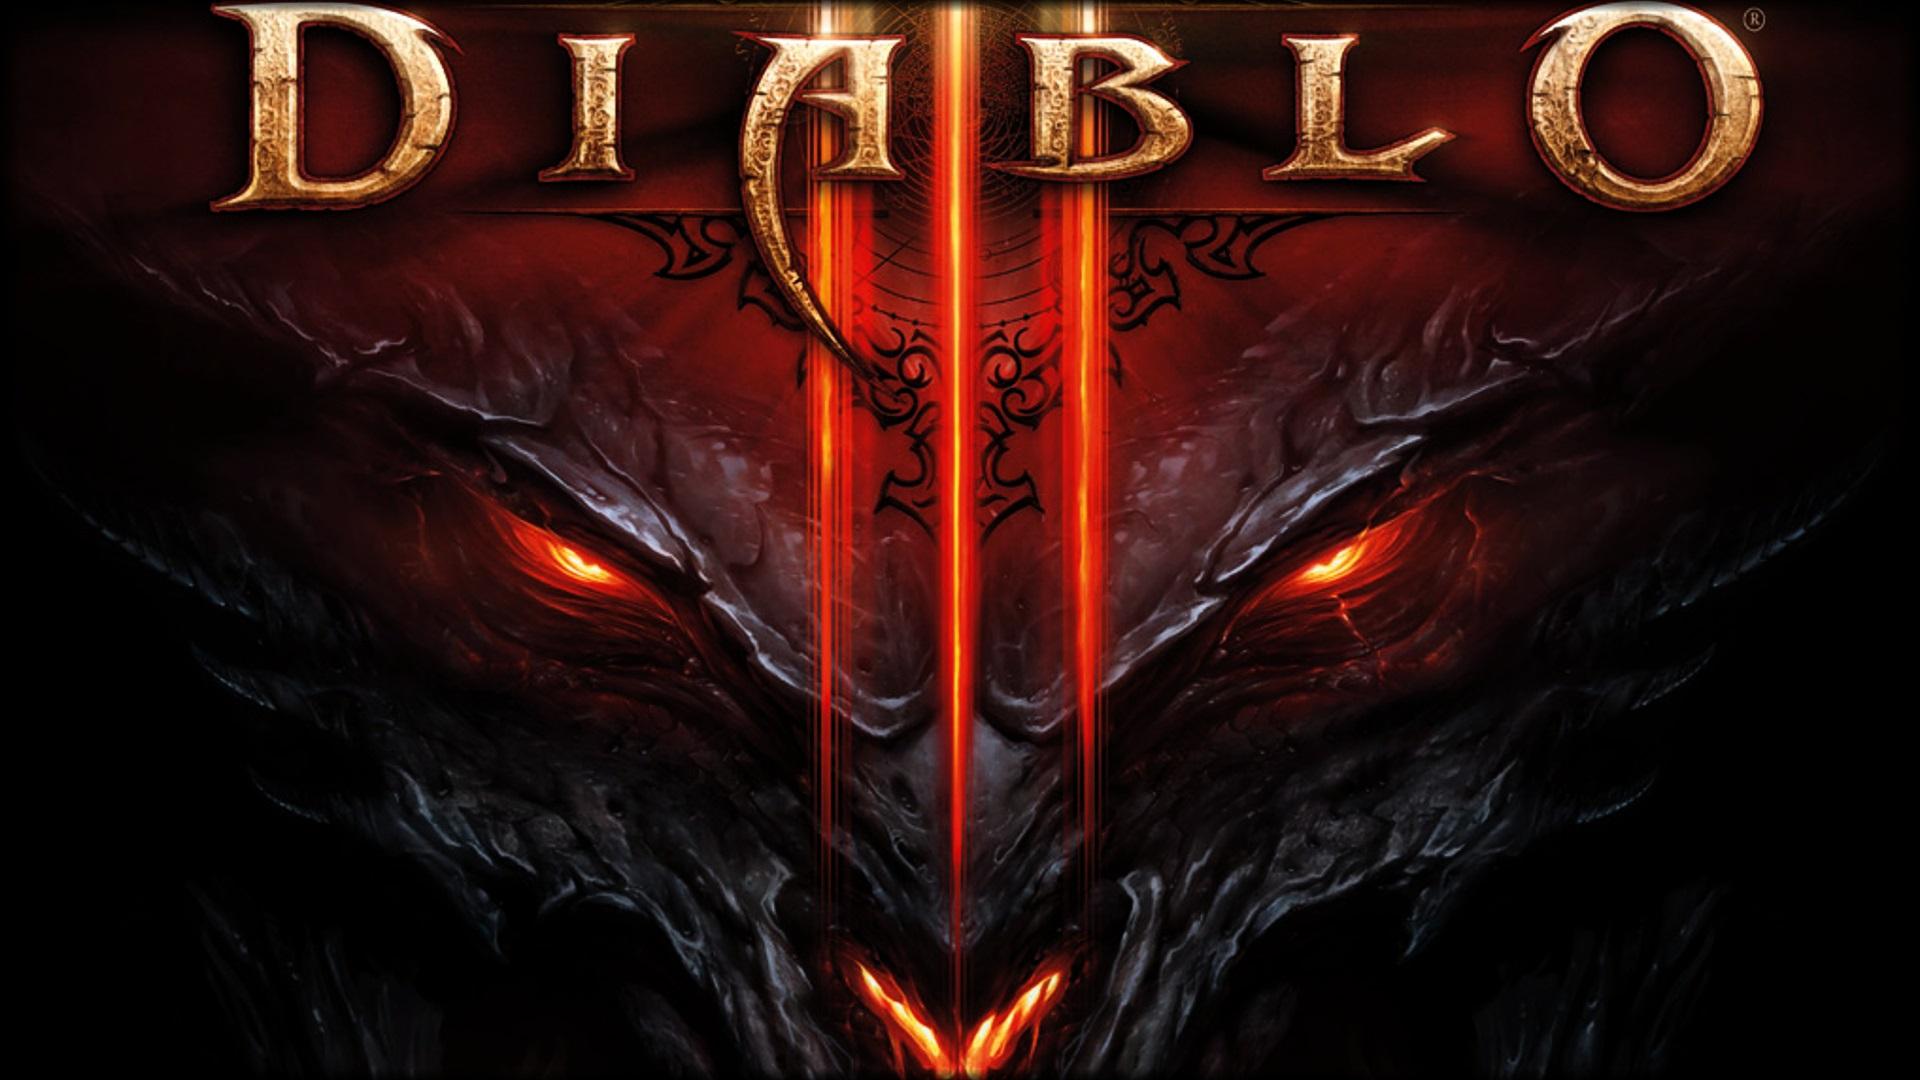 Blizzard Seeking a Director for New 'Diablo' Game